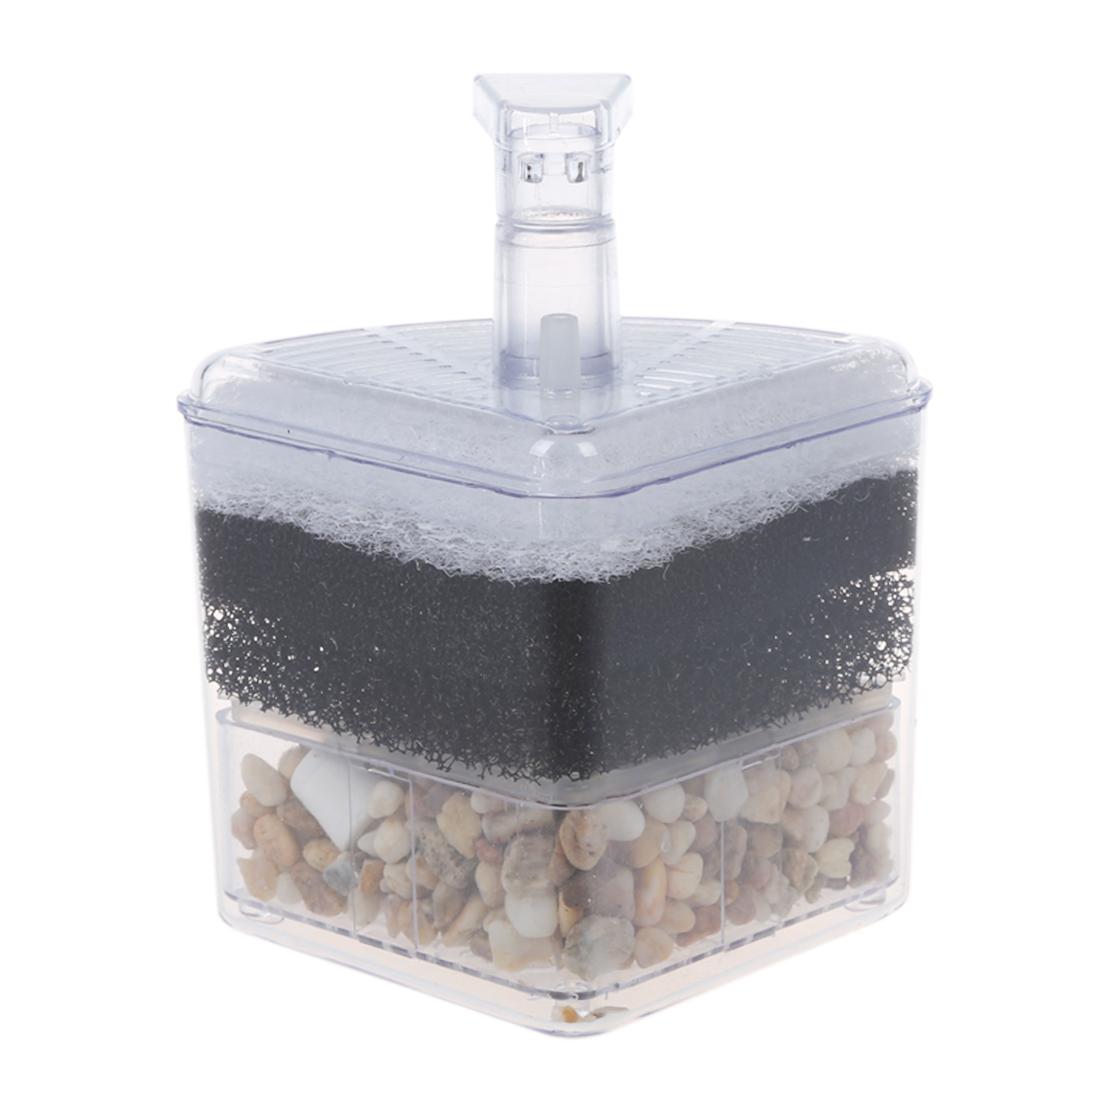 effizienter ecke filter fuer aquarium dkvw ebay. Black Bedroom Furniture Sets. Home Design Ideas